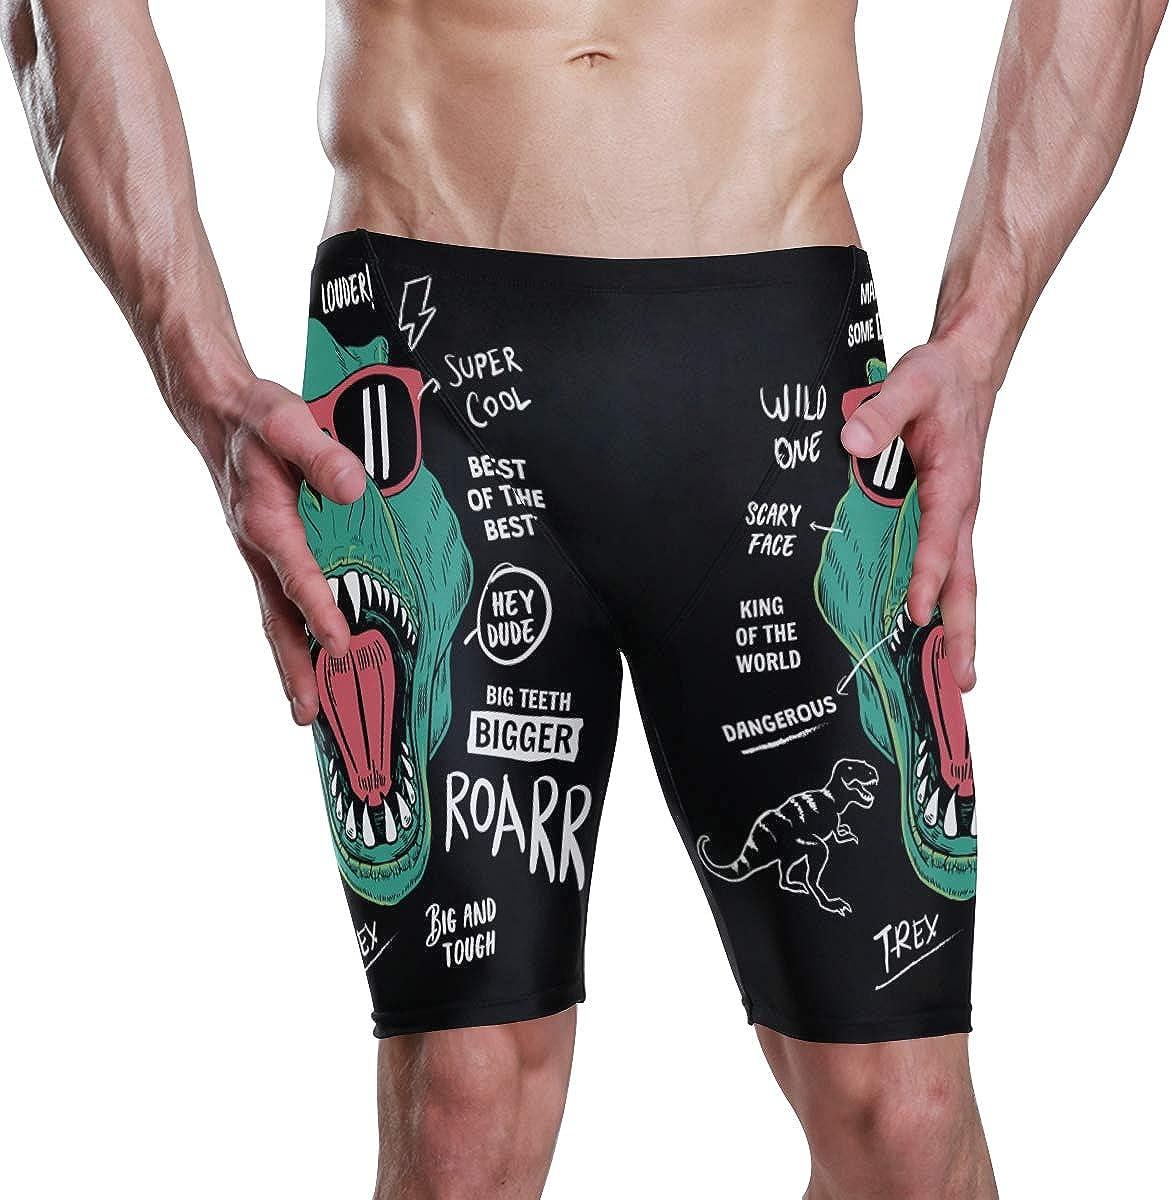 Mr.Lucien Lion Animal Jammer Swimsuit Bathing Suit Cool 2020327